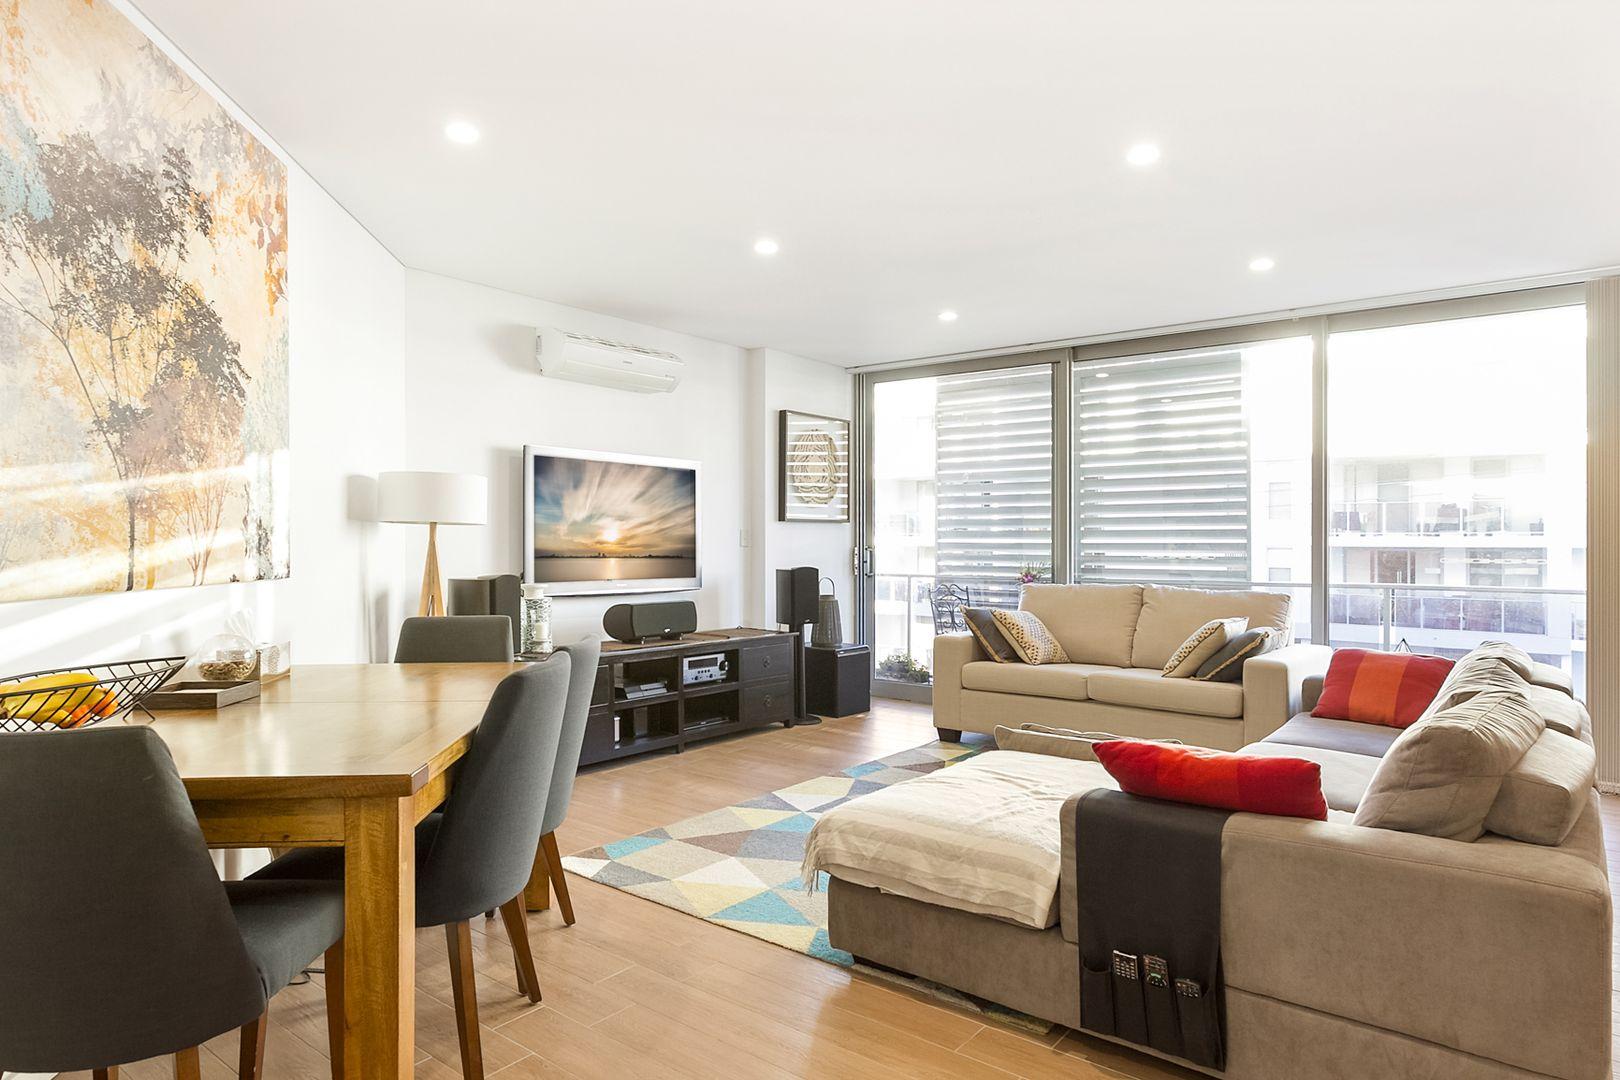 21/16 Reede  Street, Turrella NSW 2205, Image 1